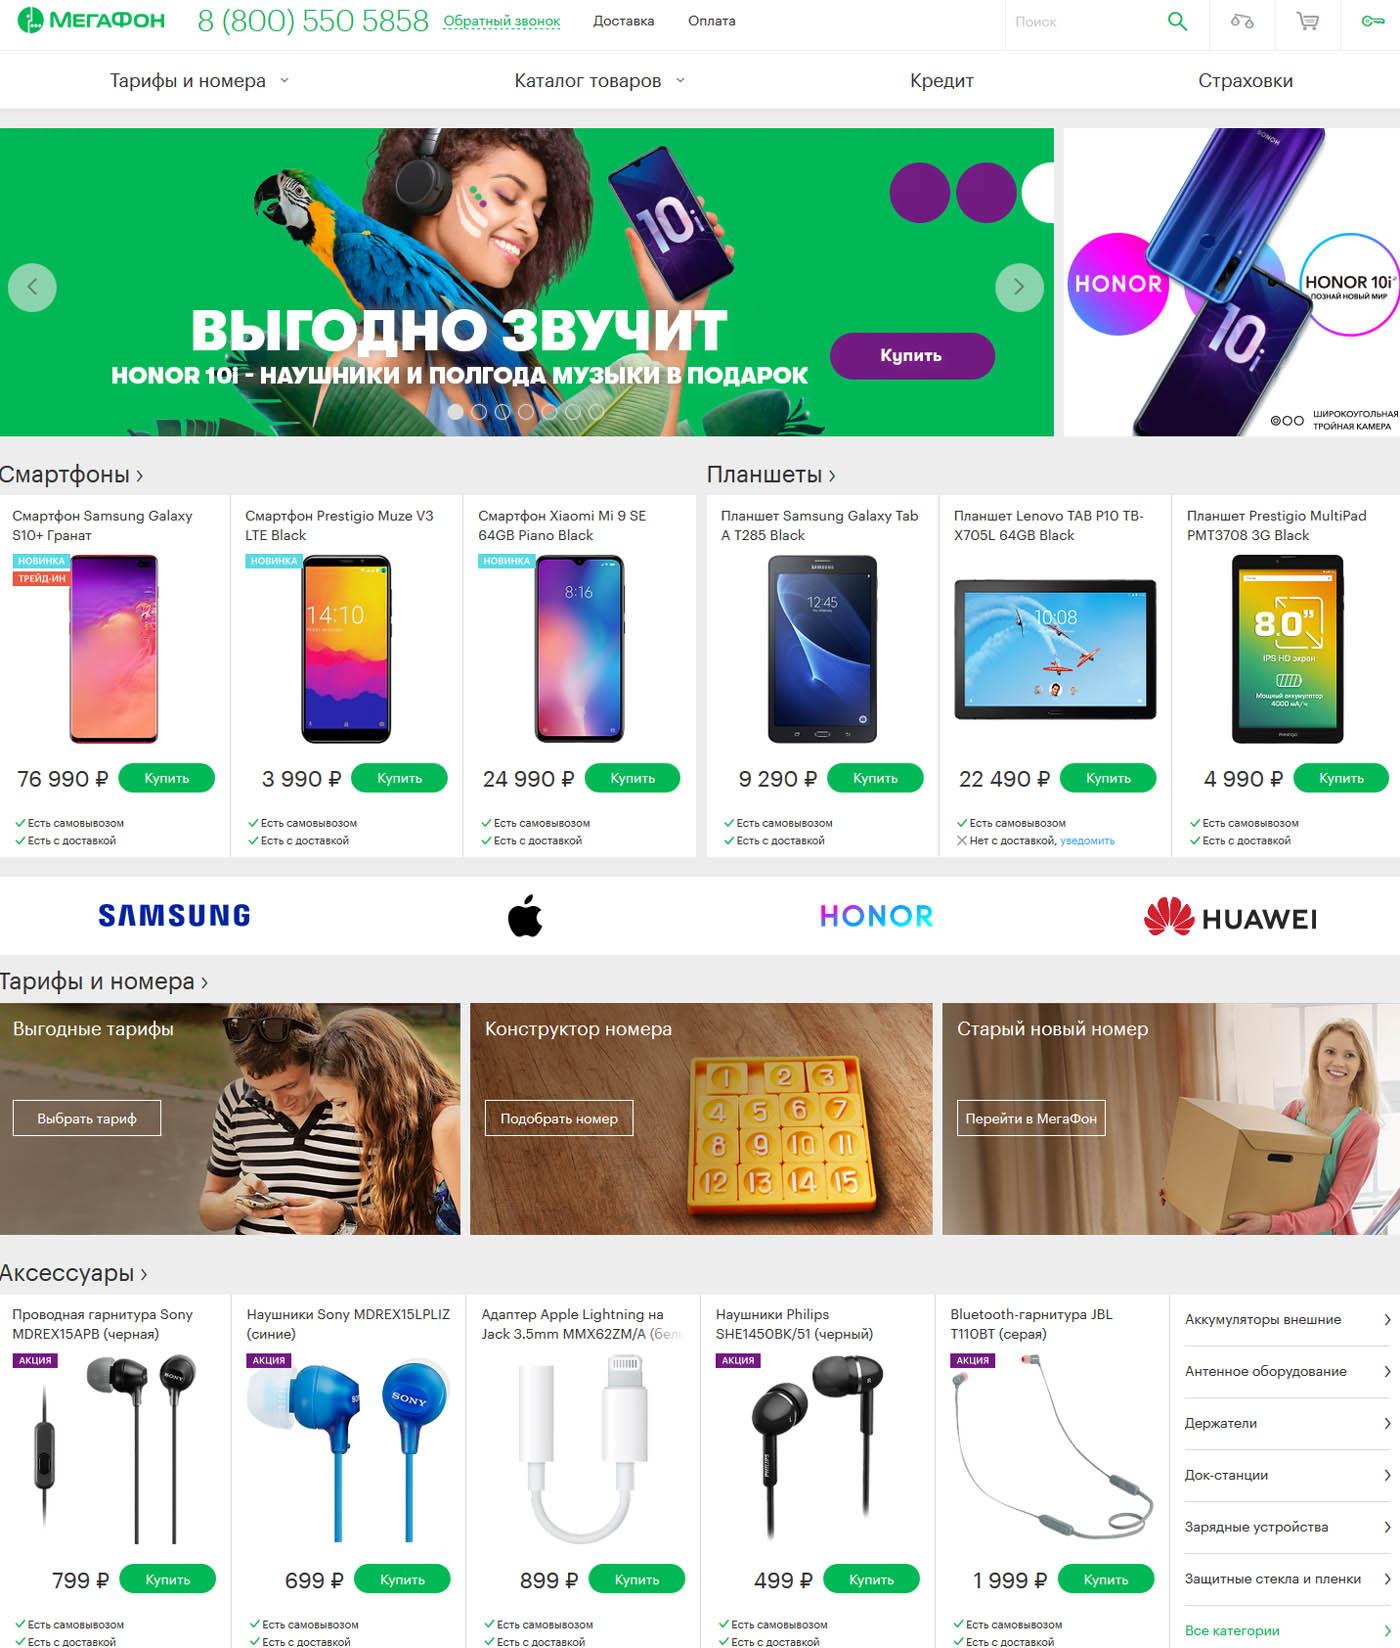 Интернет-магазин Мегафон